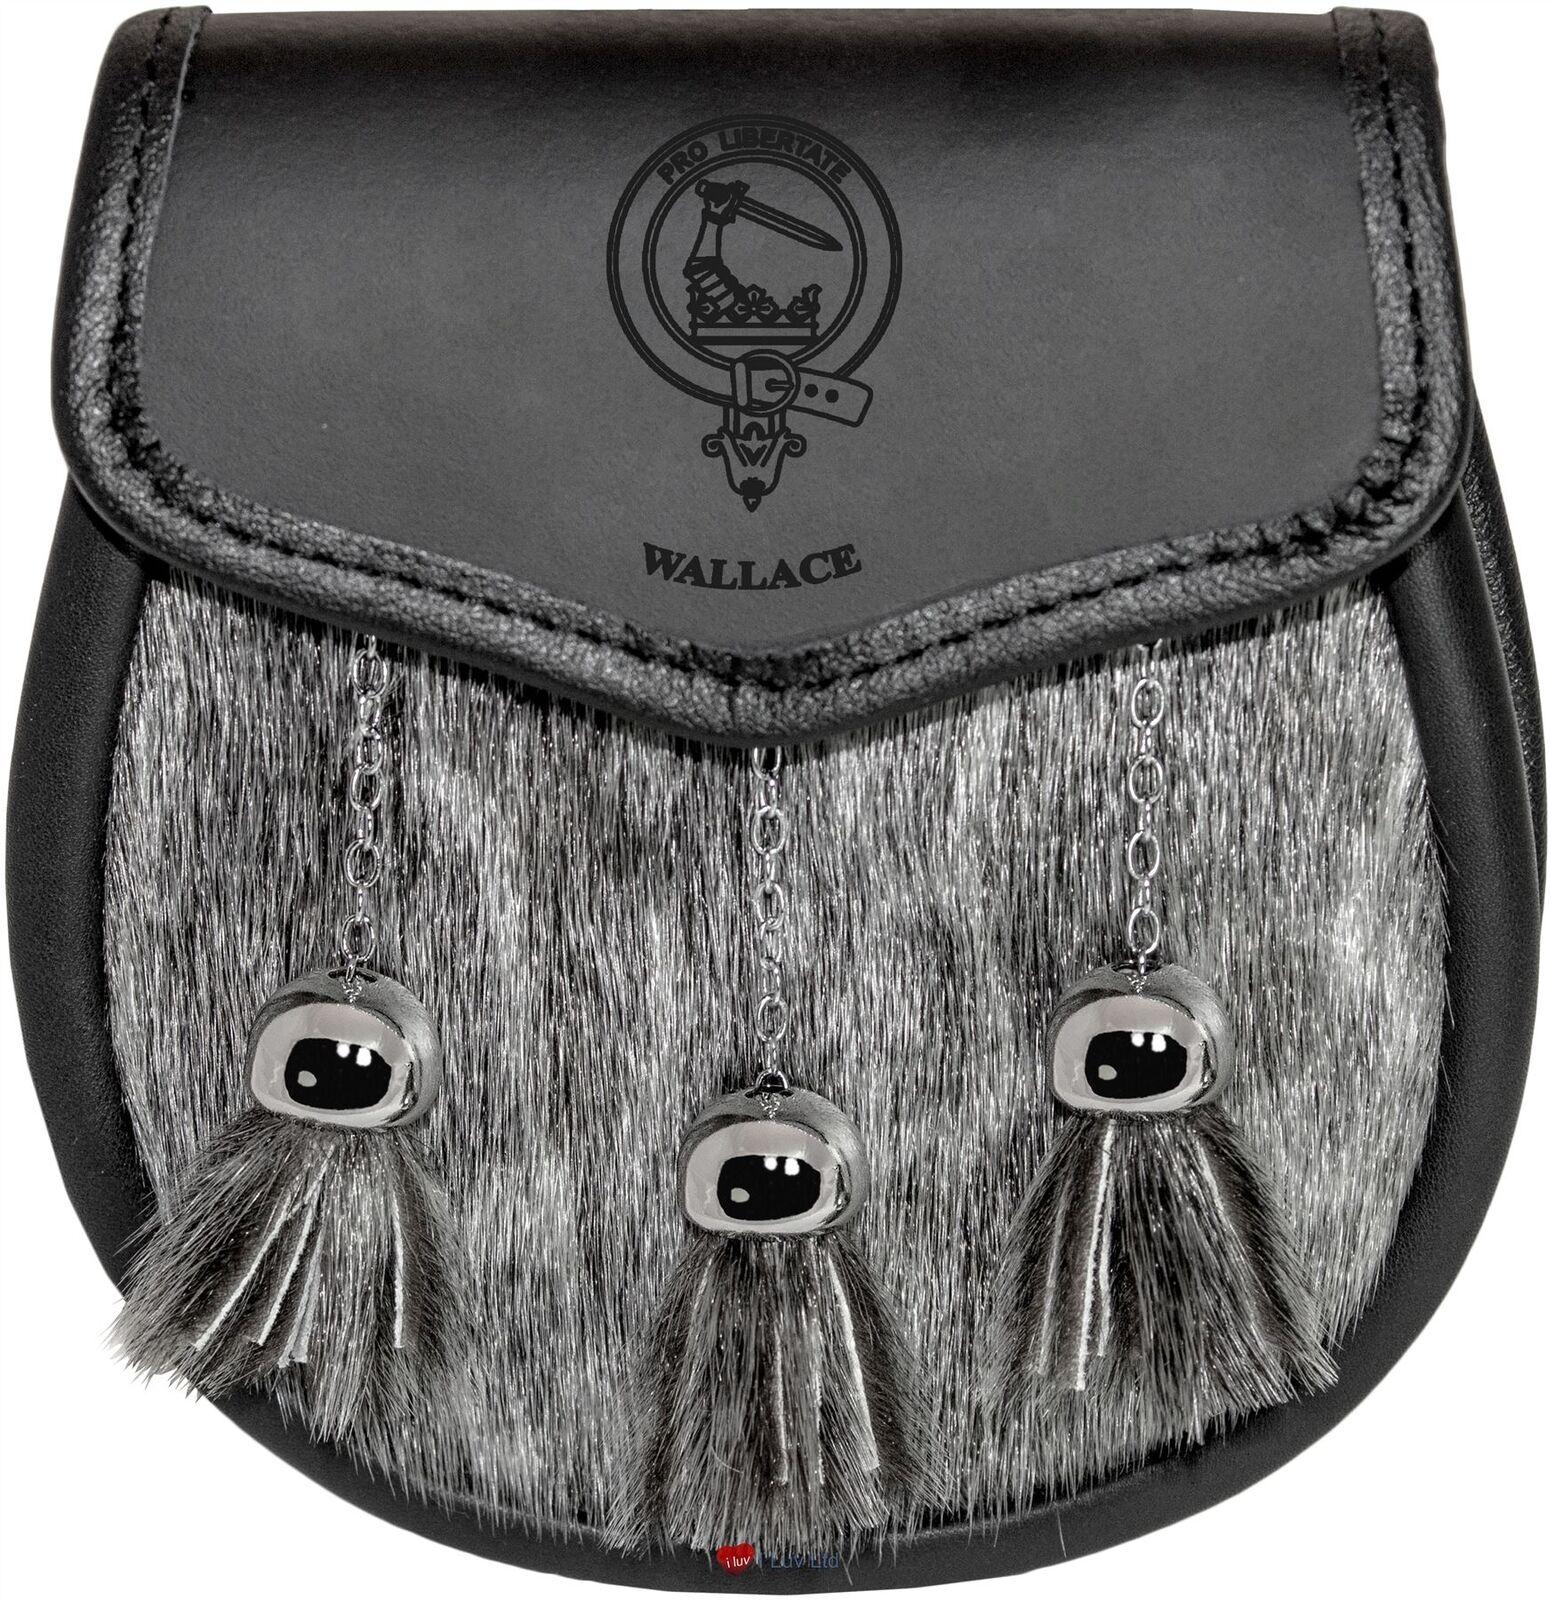 Wallace Semi Dress Sporran Fur Plain Leather Flap Scottish Clan Crest